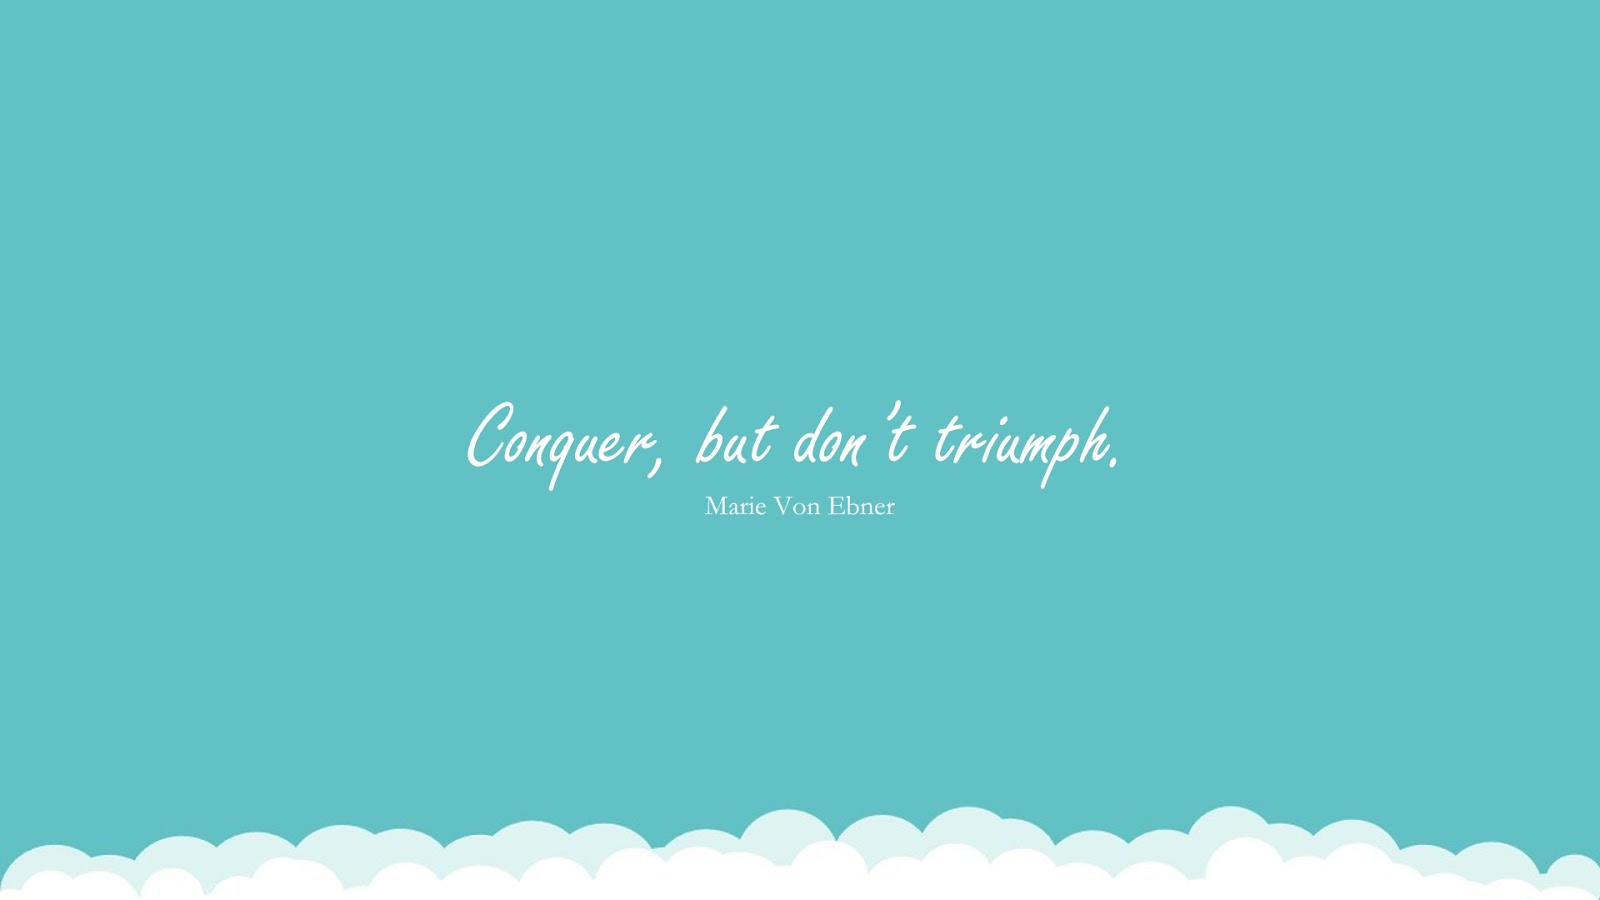 Conquer, but don't triumph. (Marie Von Ebner);  #SuccessQuotes